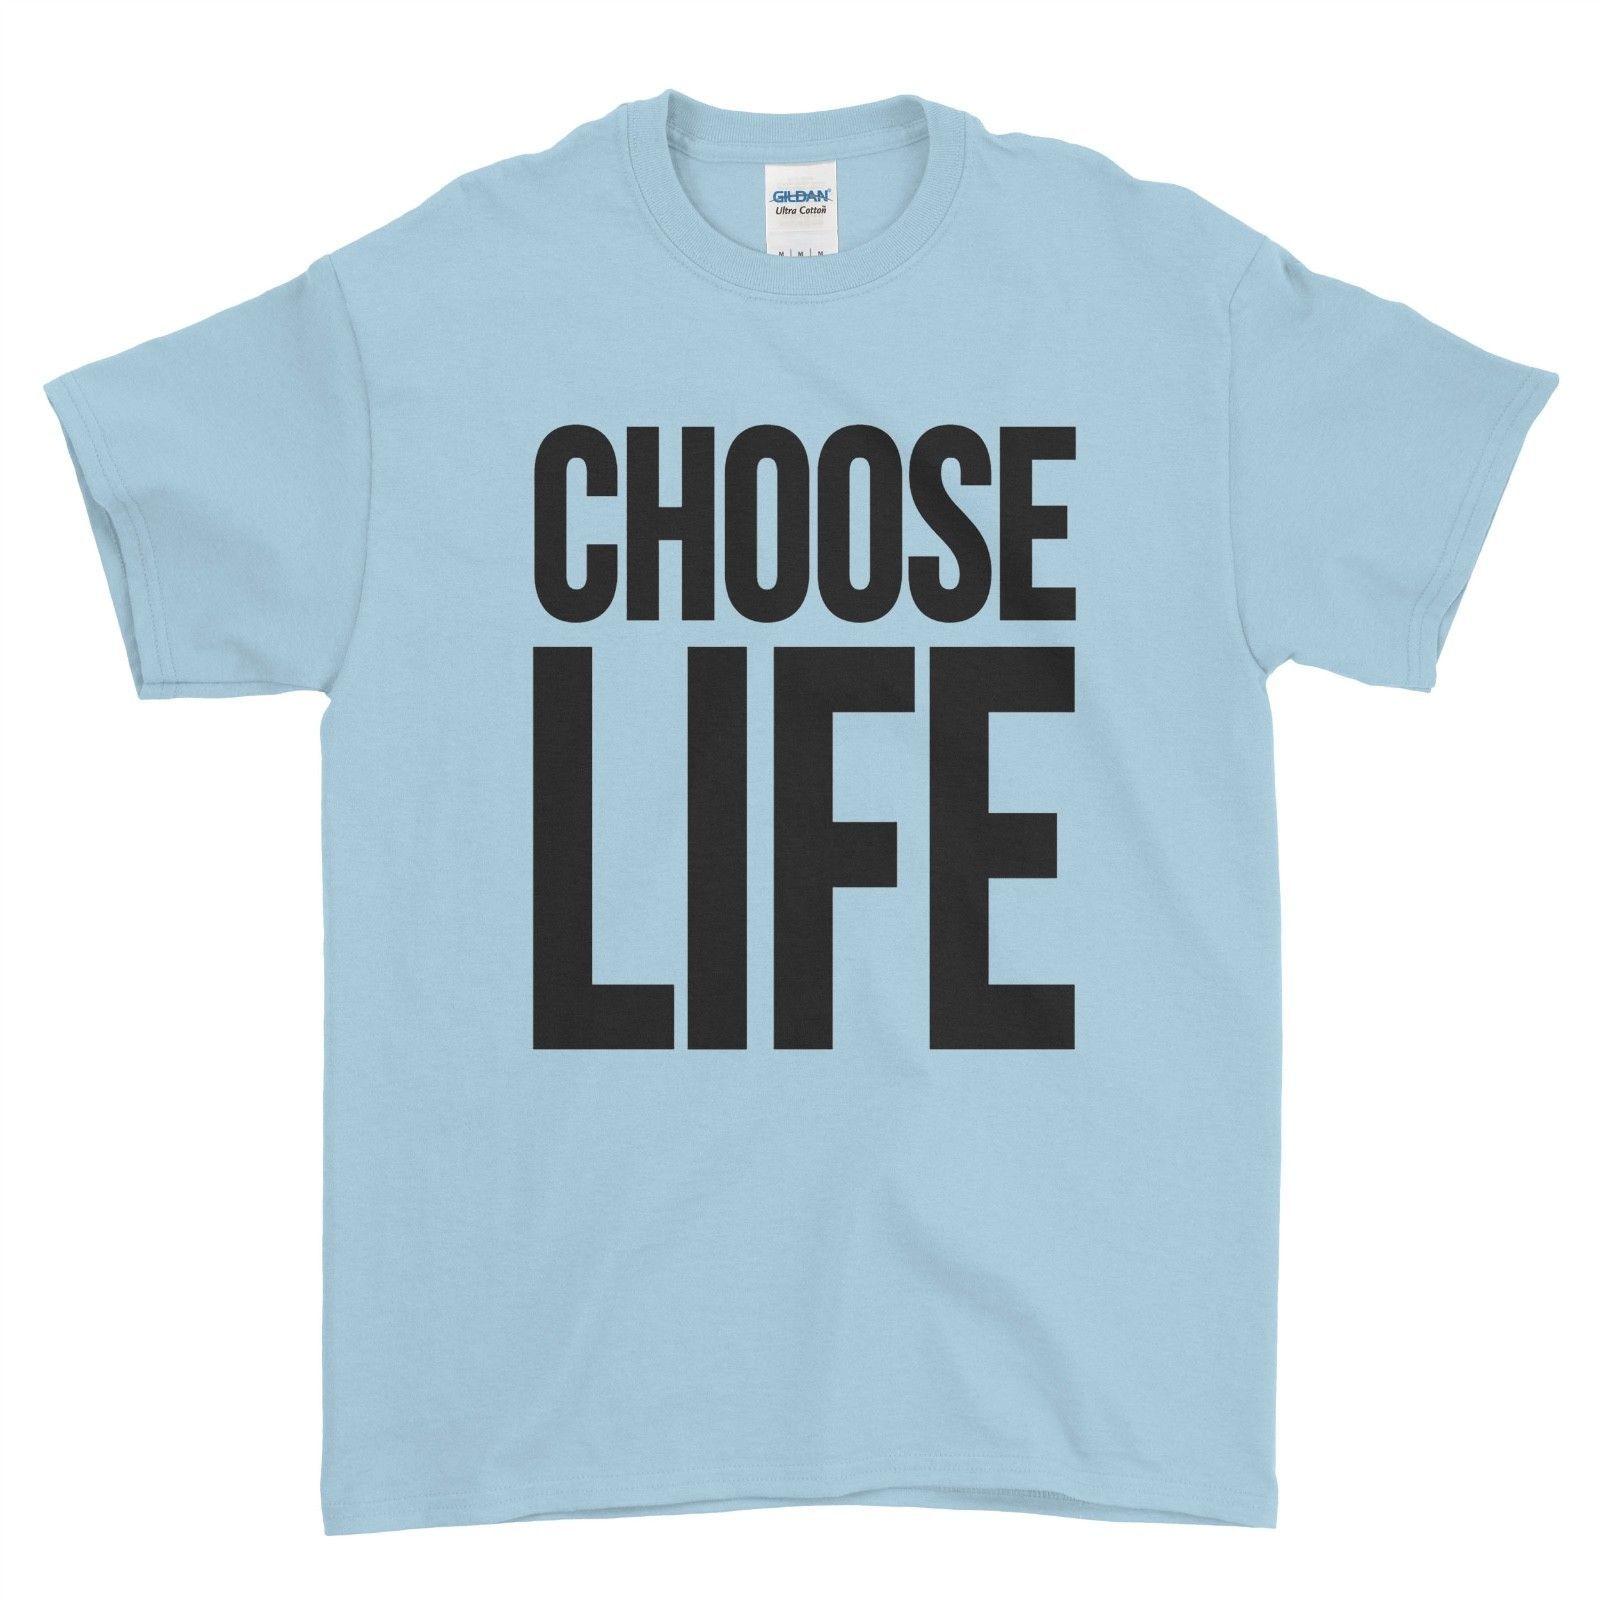 6fcf71b2 I Love The 80s Print T Shirt Top Off Shoulder Ladies Womens Retro 6016455®  Lot ...